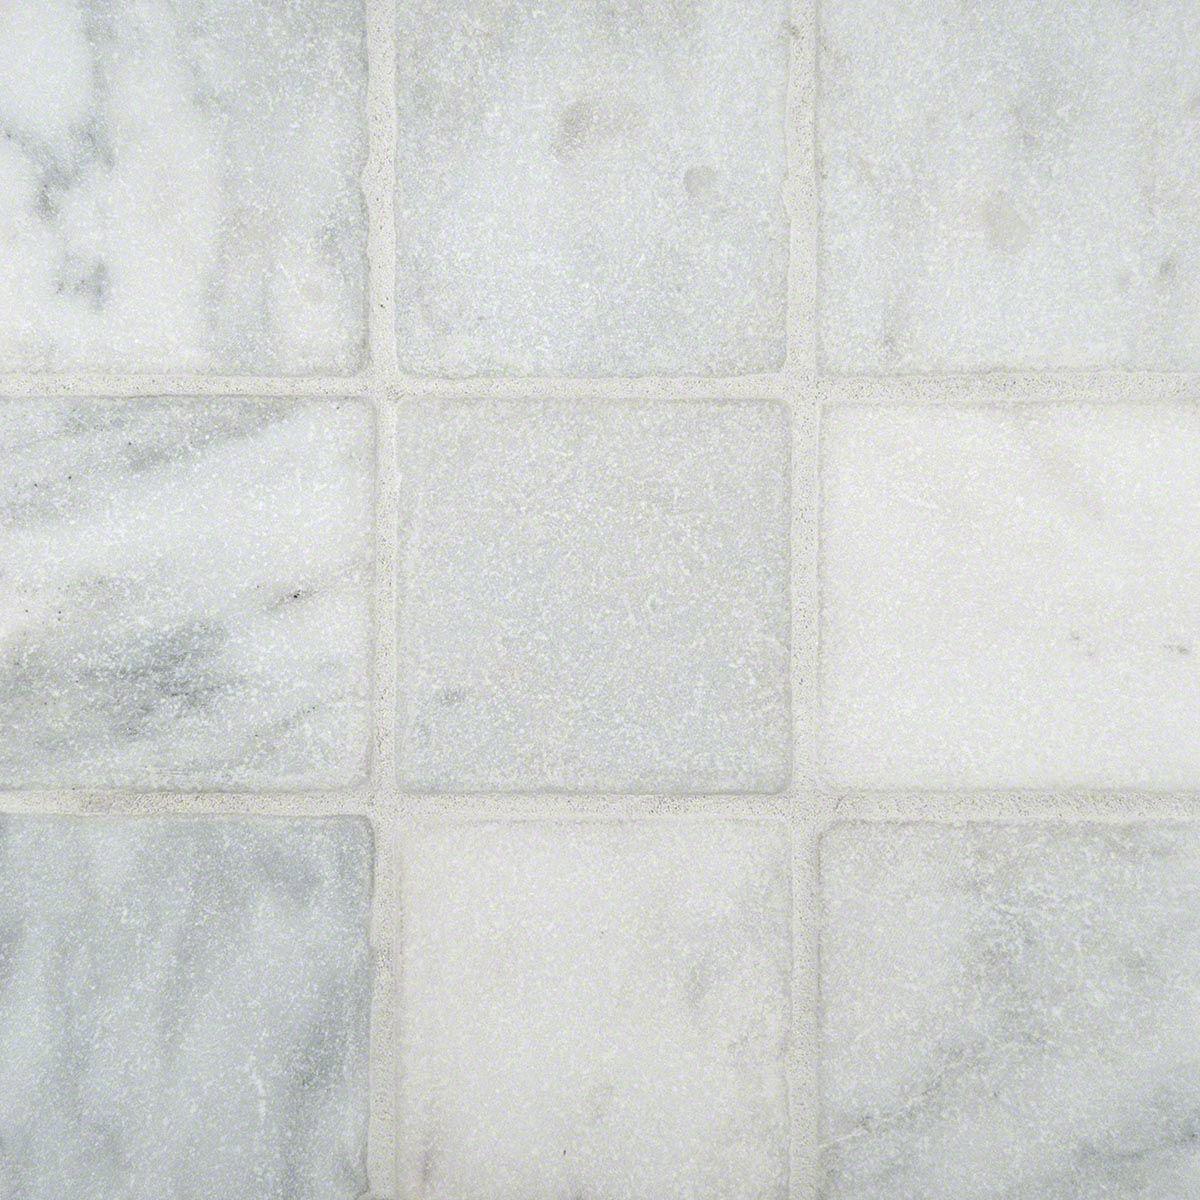 Alya tile 4x4 white carrara tumbled marble tile alya tile alya tile 4x4 white carrara tumbled marble tile dailygadgetfo Images